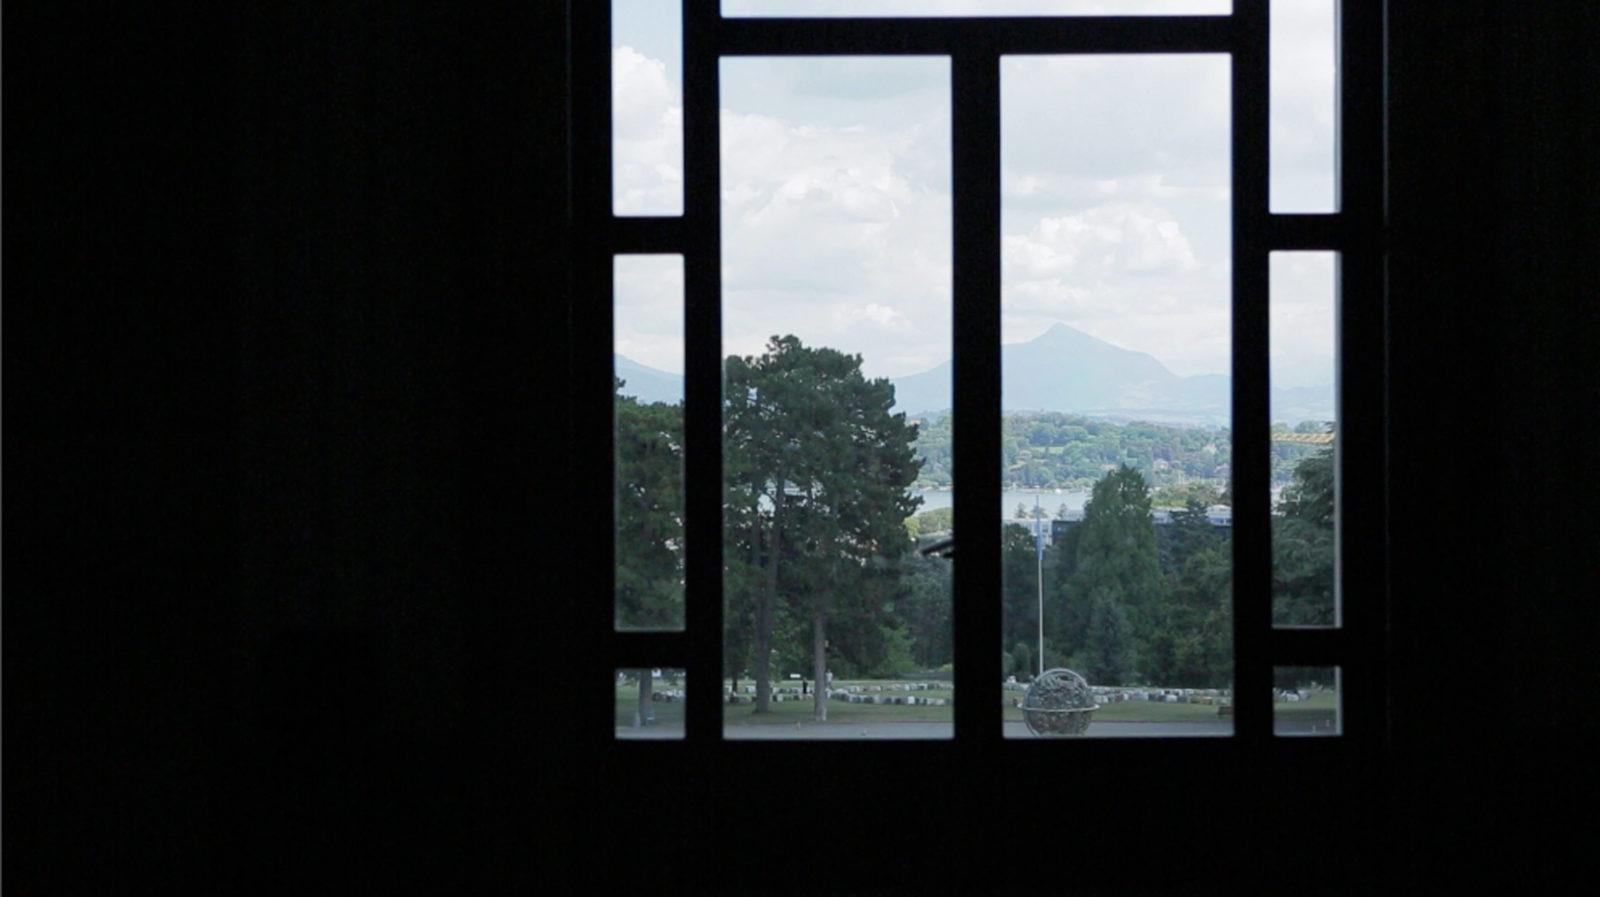 photogramme300dpi-011